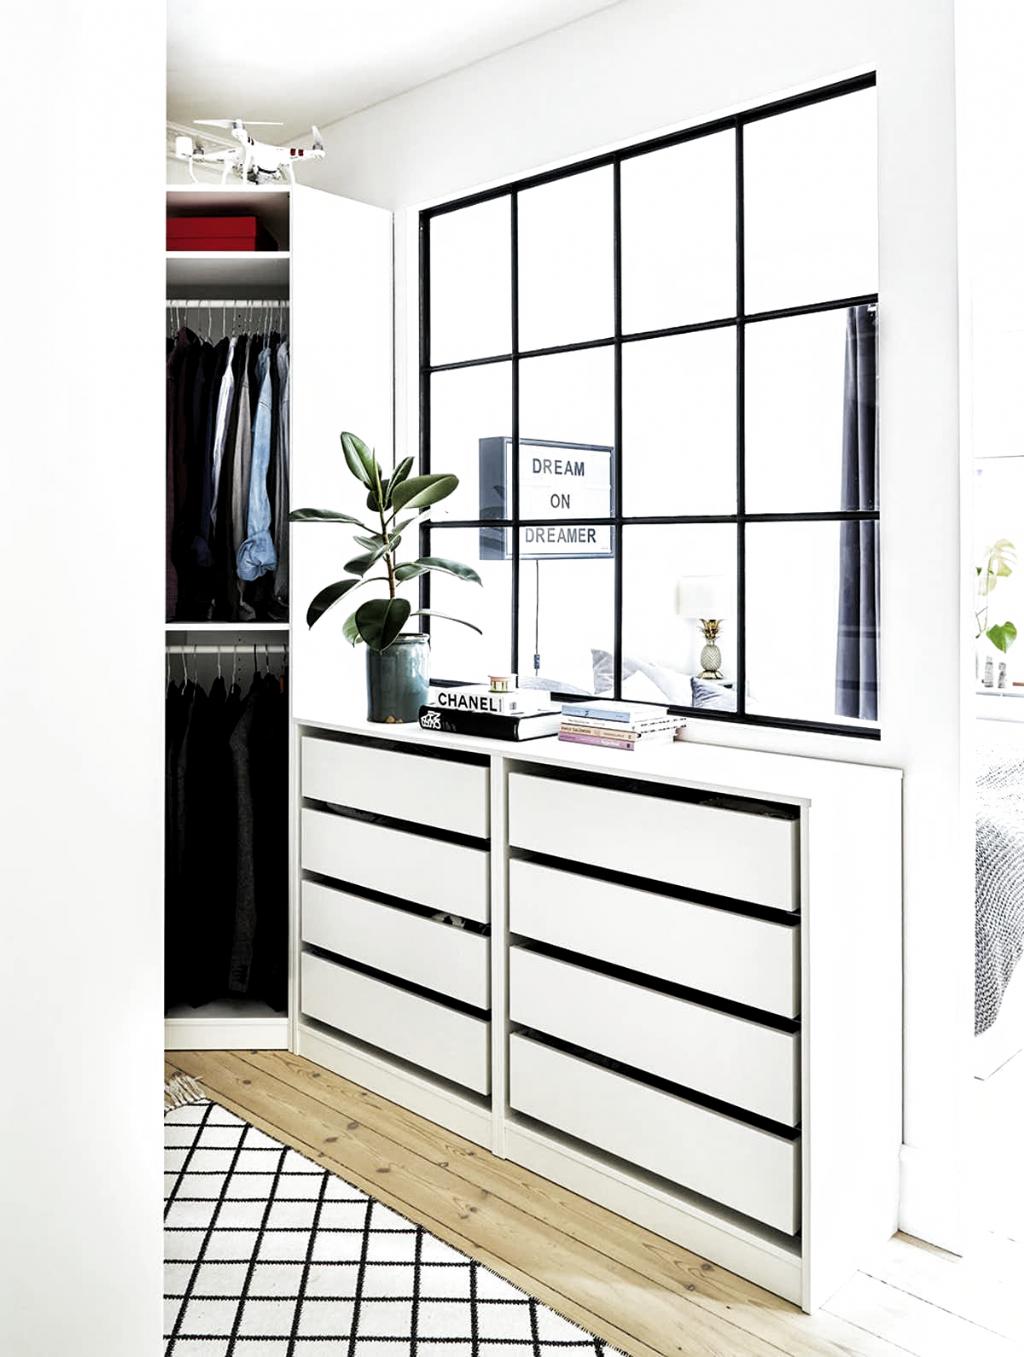 Sadan Laver Du Et Walk In Closet Selv Boligmagasinet Dk Ankleidezimmer Ikea Kommode In 2020 Ankleidezimmer Ankleide Zimmer Ankleiderzimmer